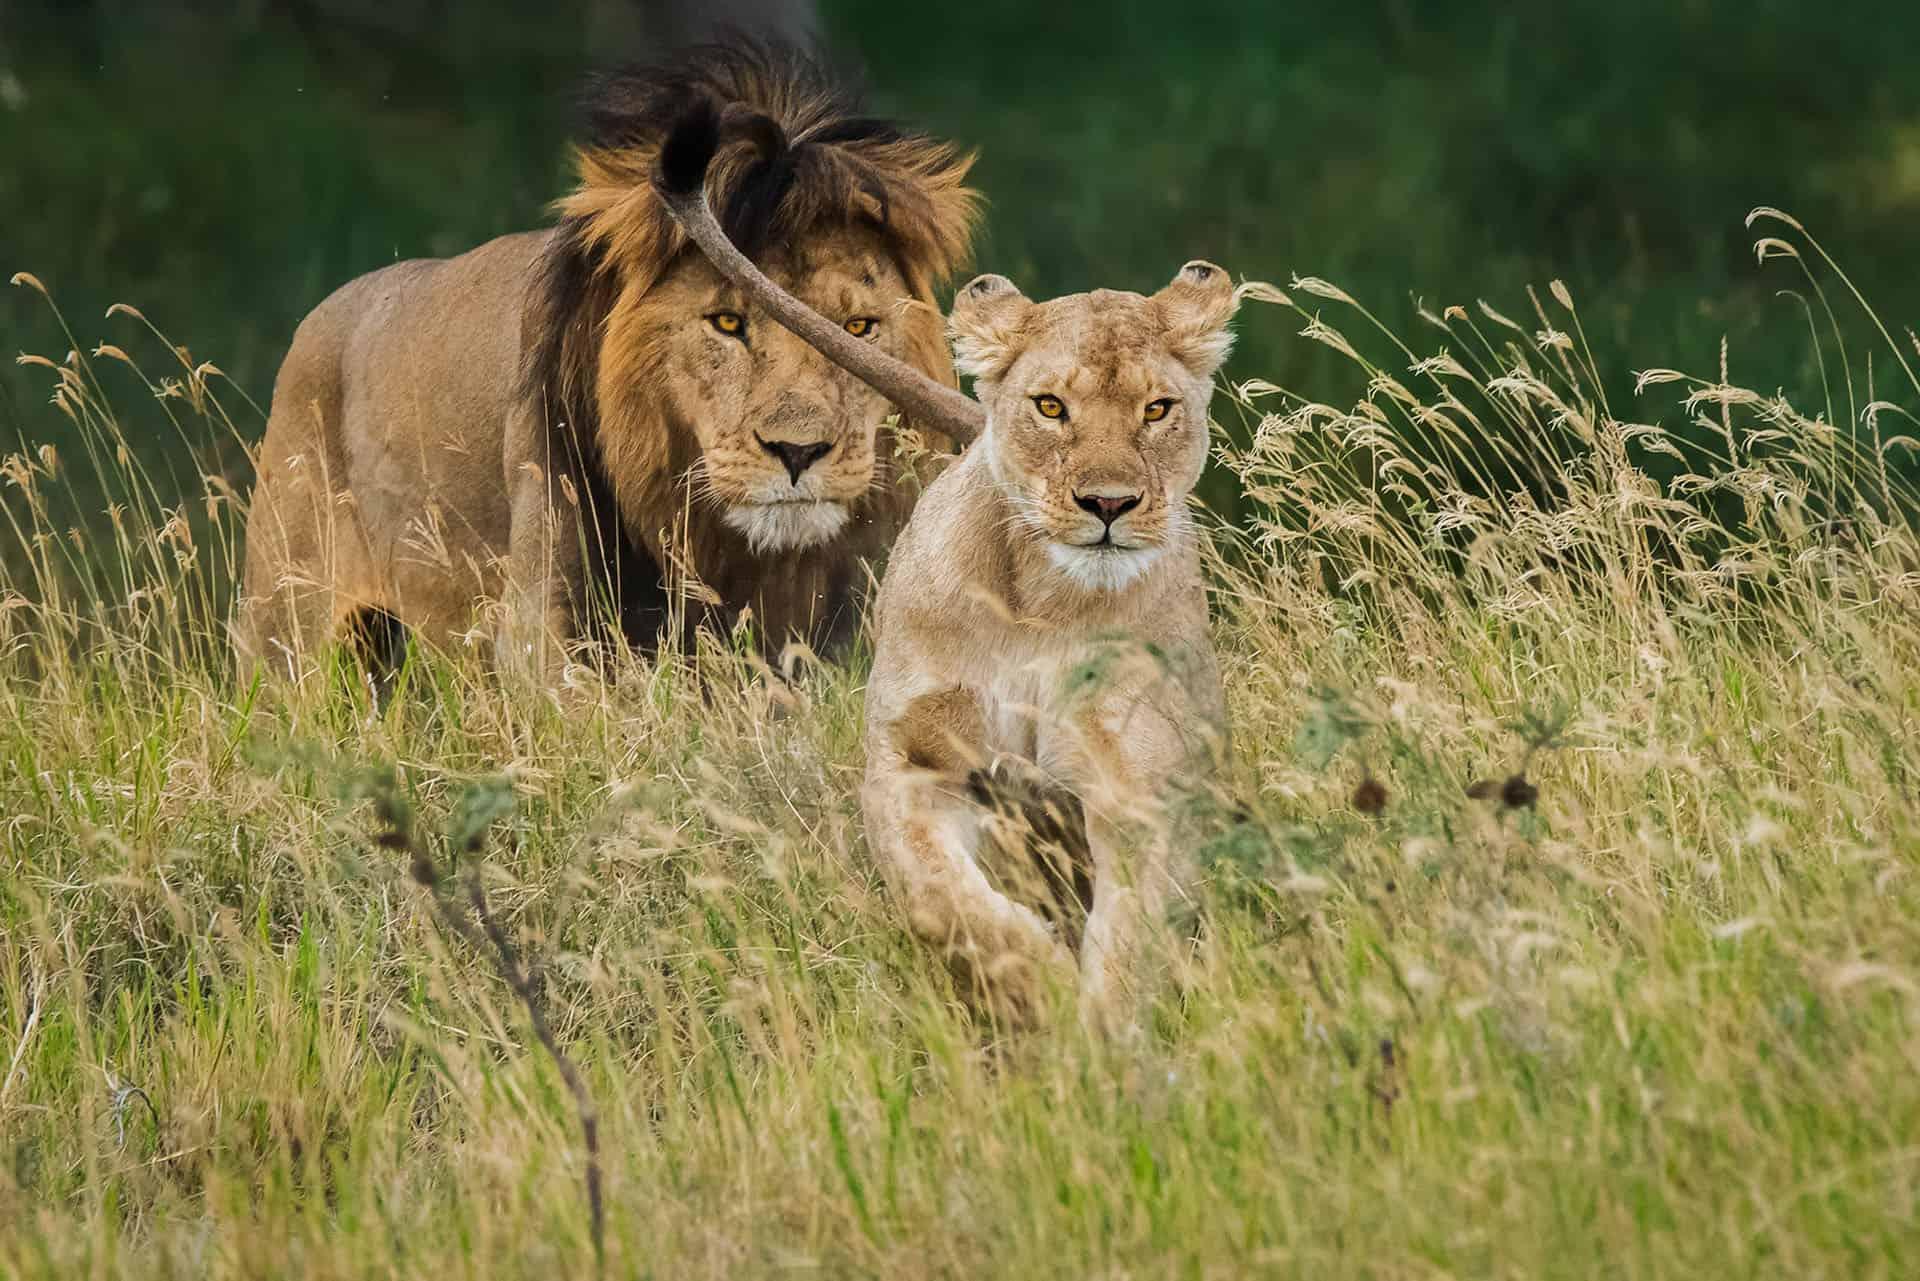 male lion chasing female lion serengeti tanzania on everyone's travel bucket lists